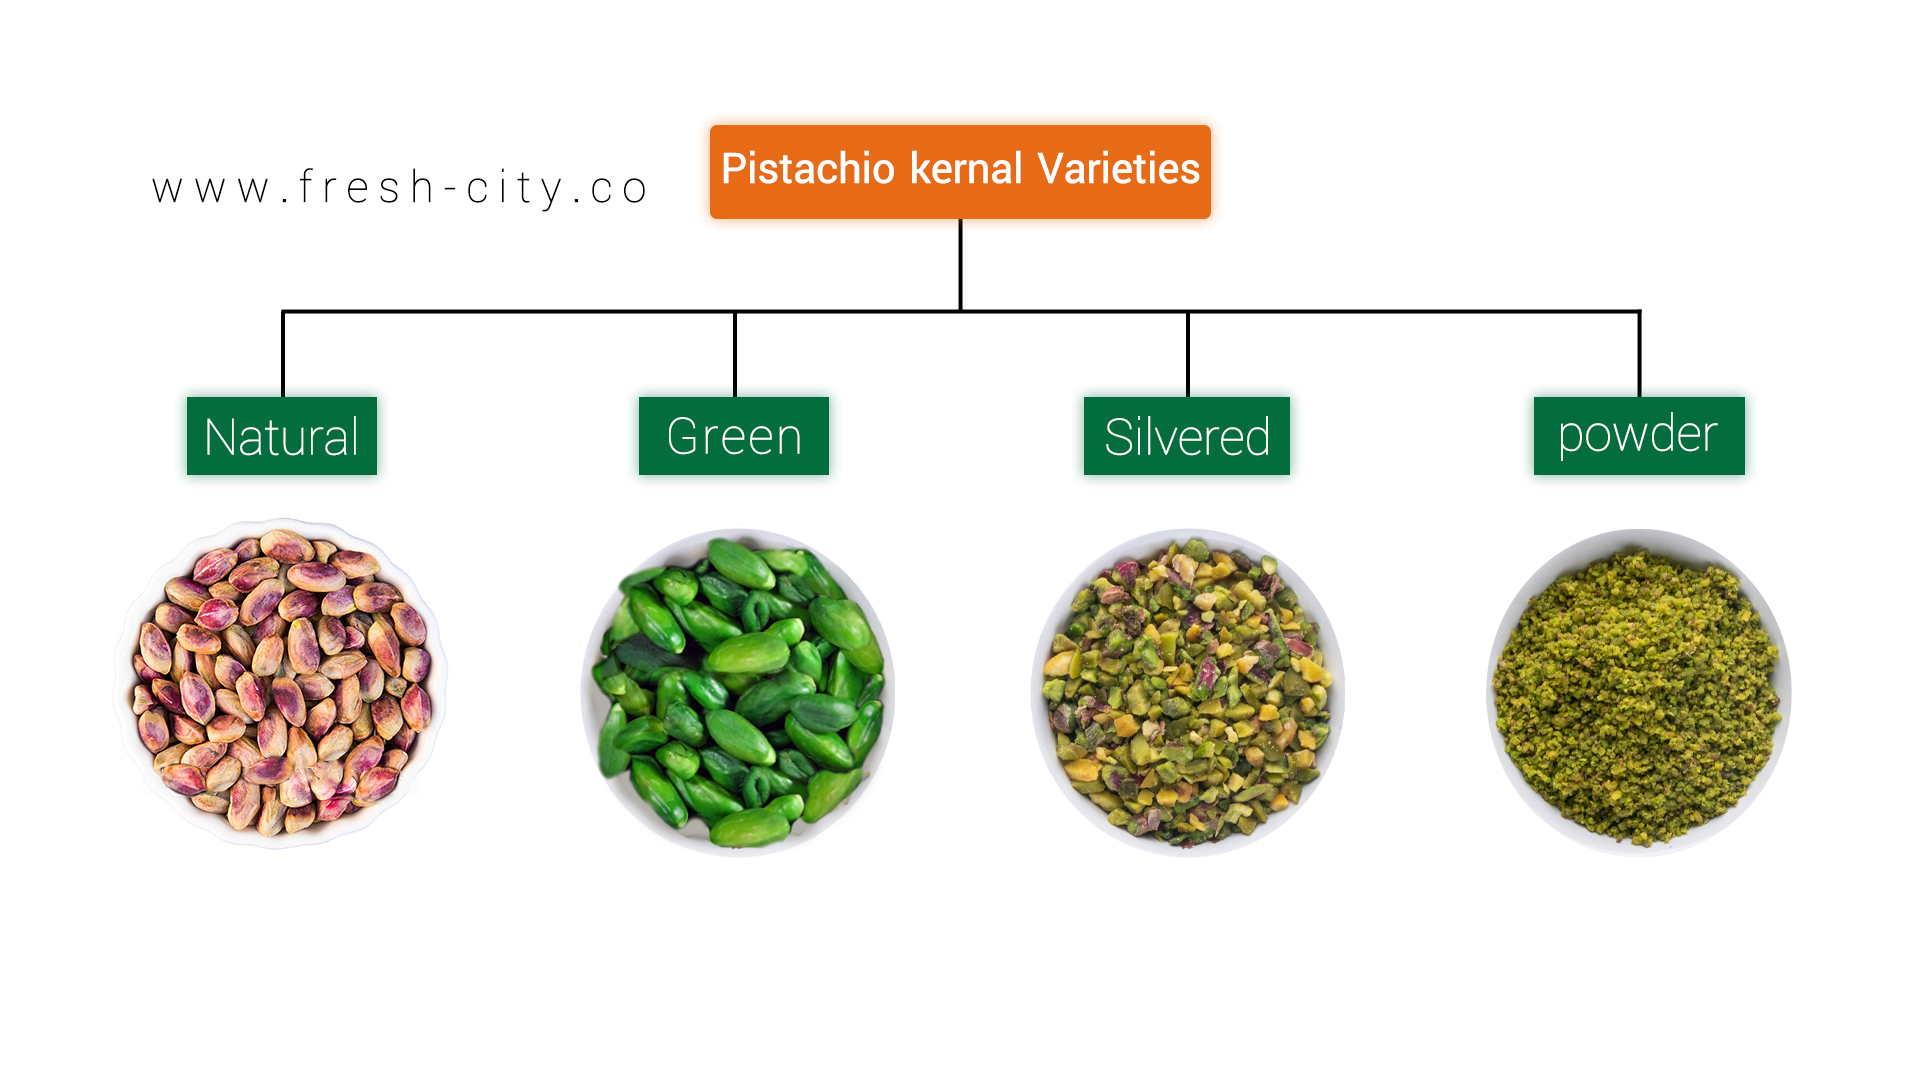 Pistachio Kernel Types